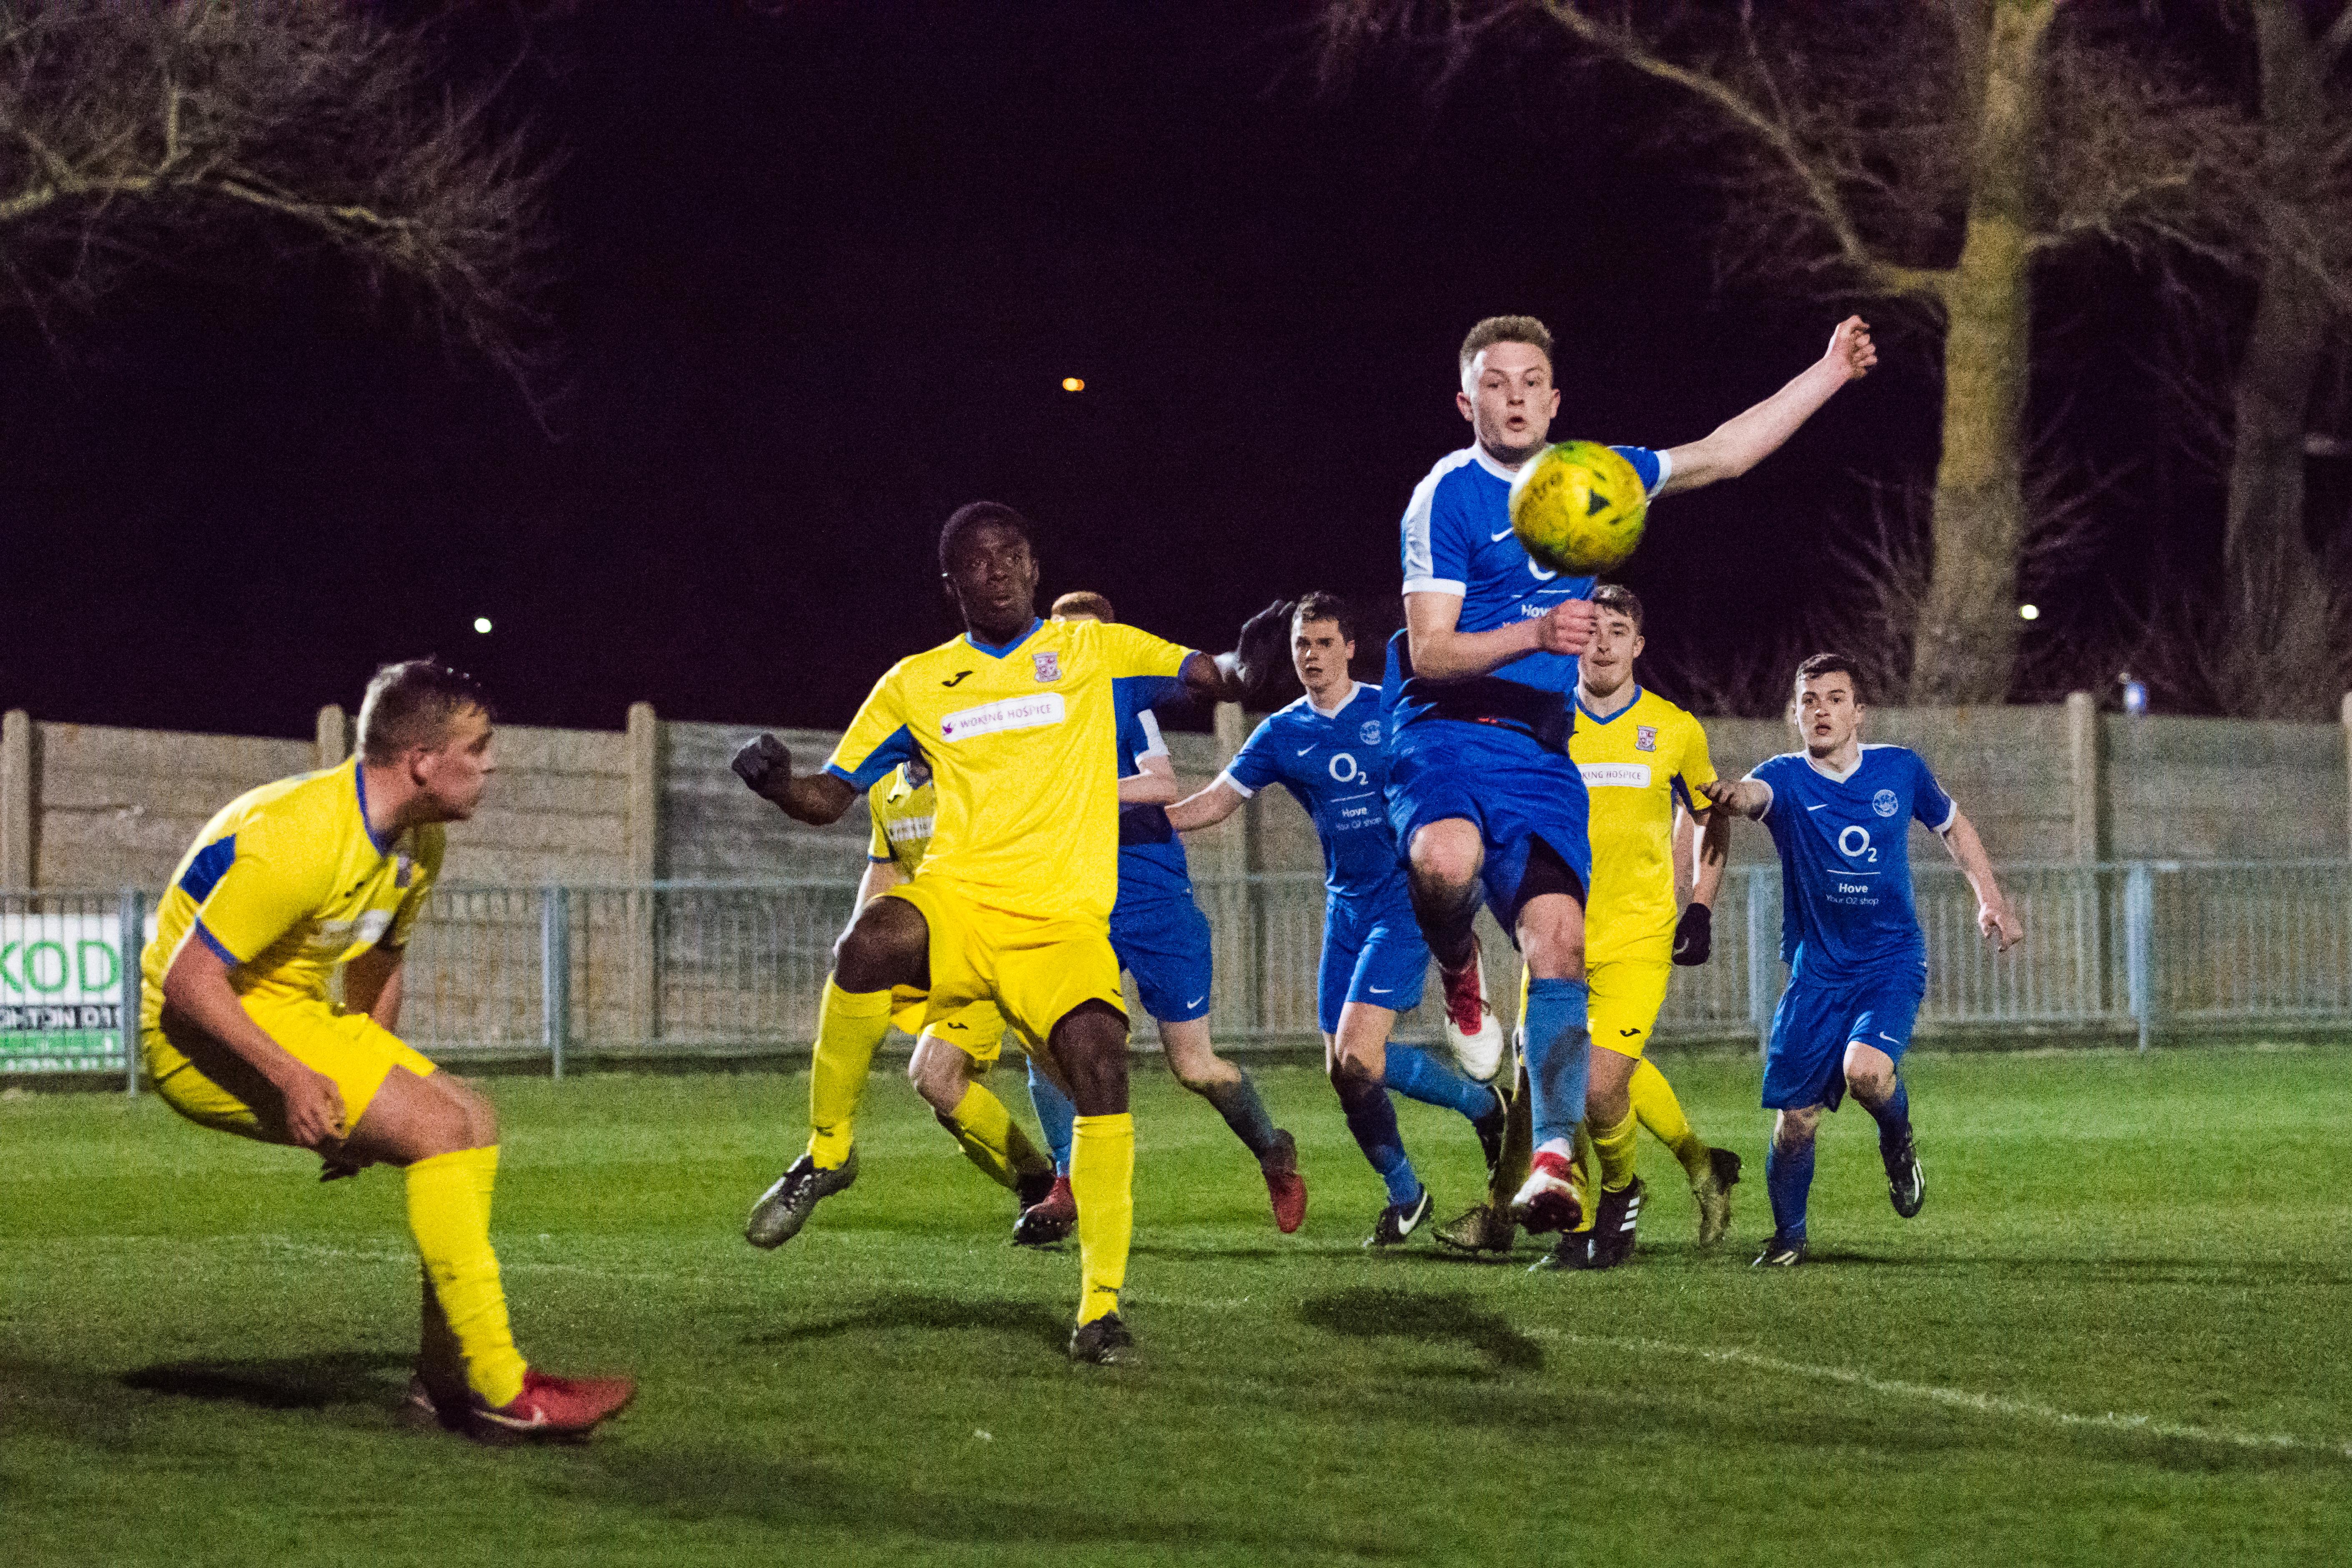 DAVID_JEFFERY Shoreham FC U18s vs Woking FC Academy 22.03.18 39